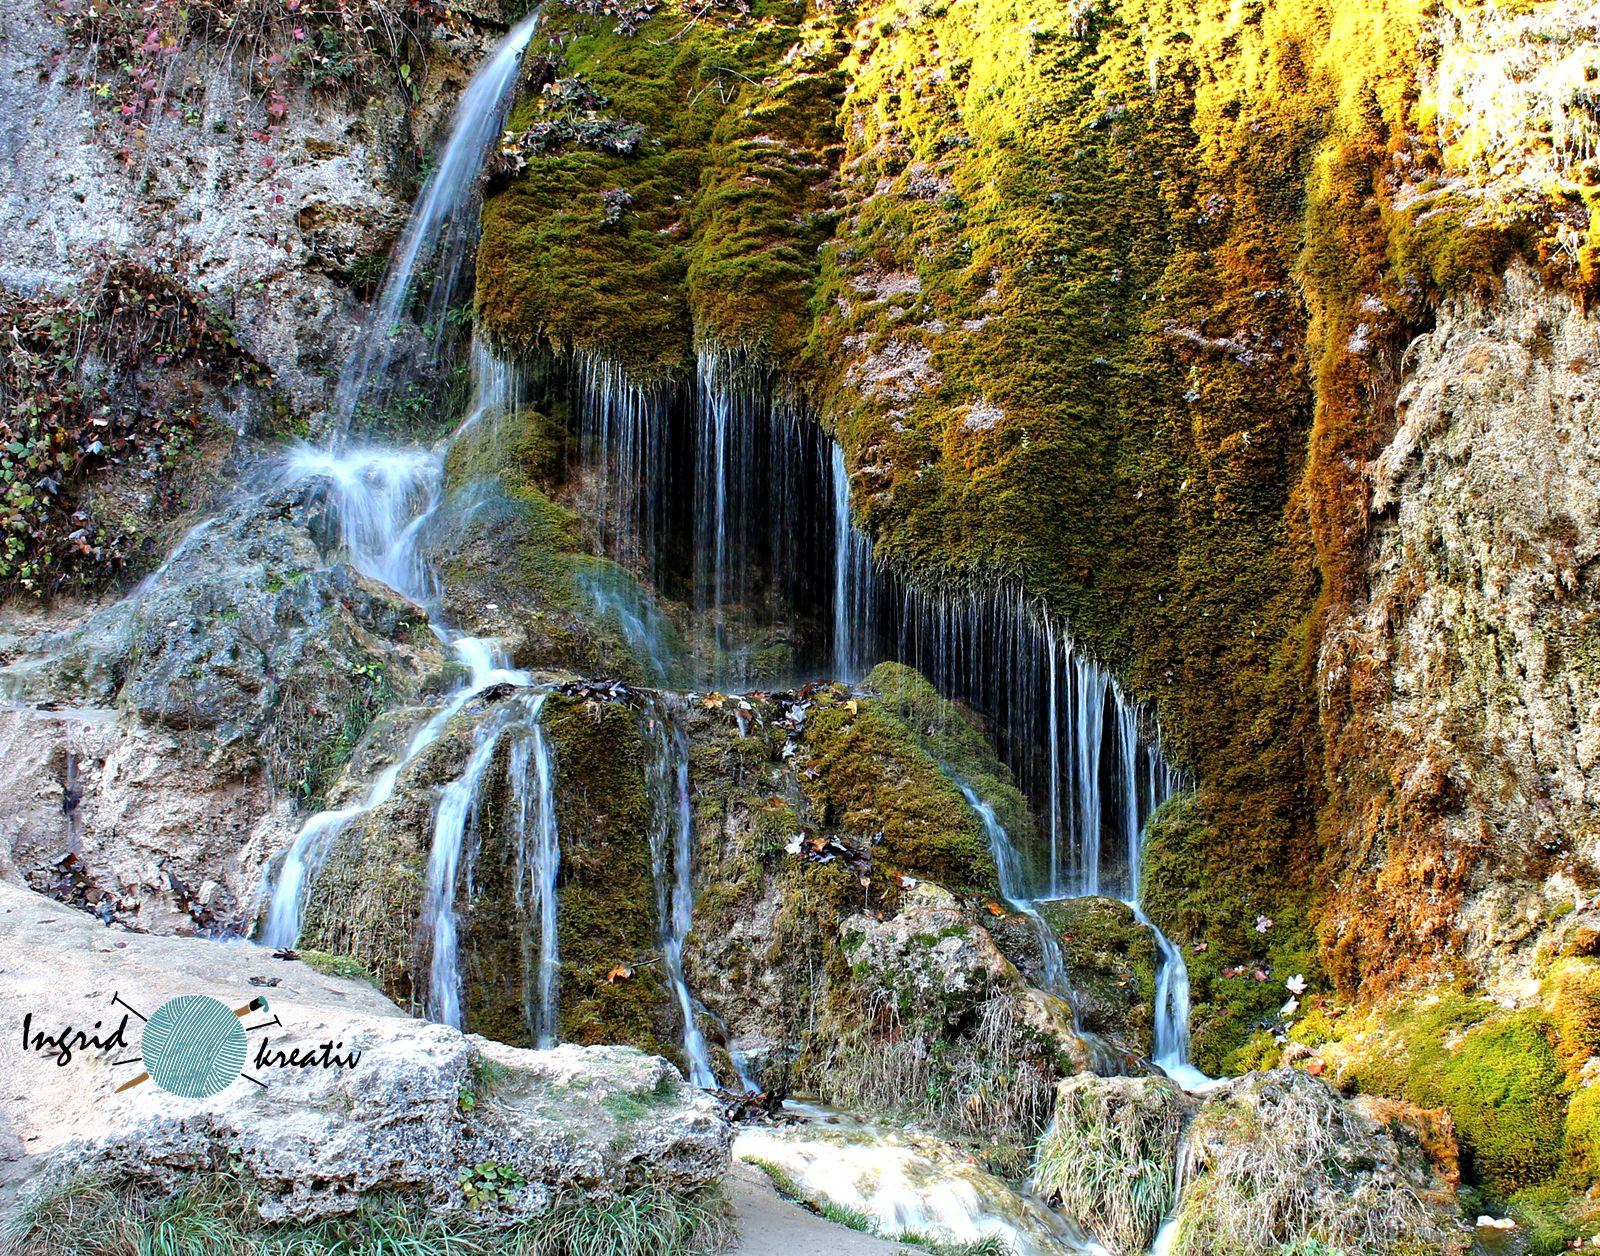 dreimühlen wasserfall nohn vulkaneifel kalksinterterrassen